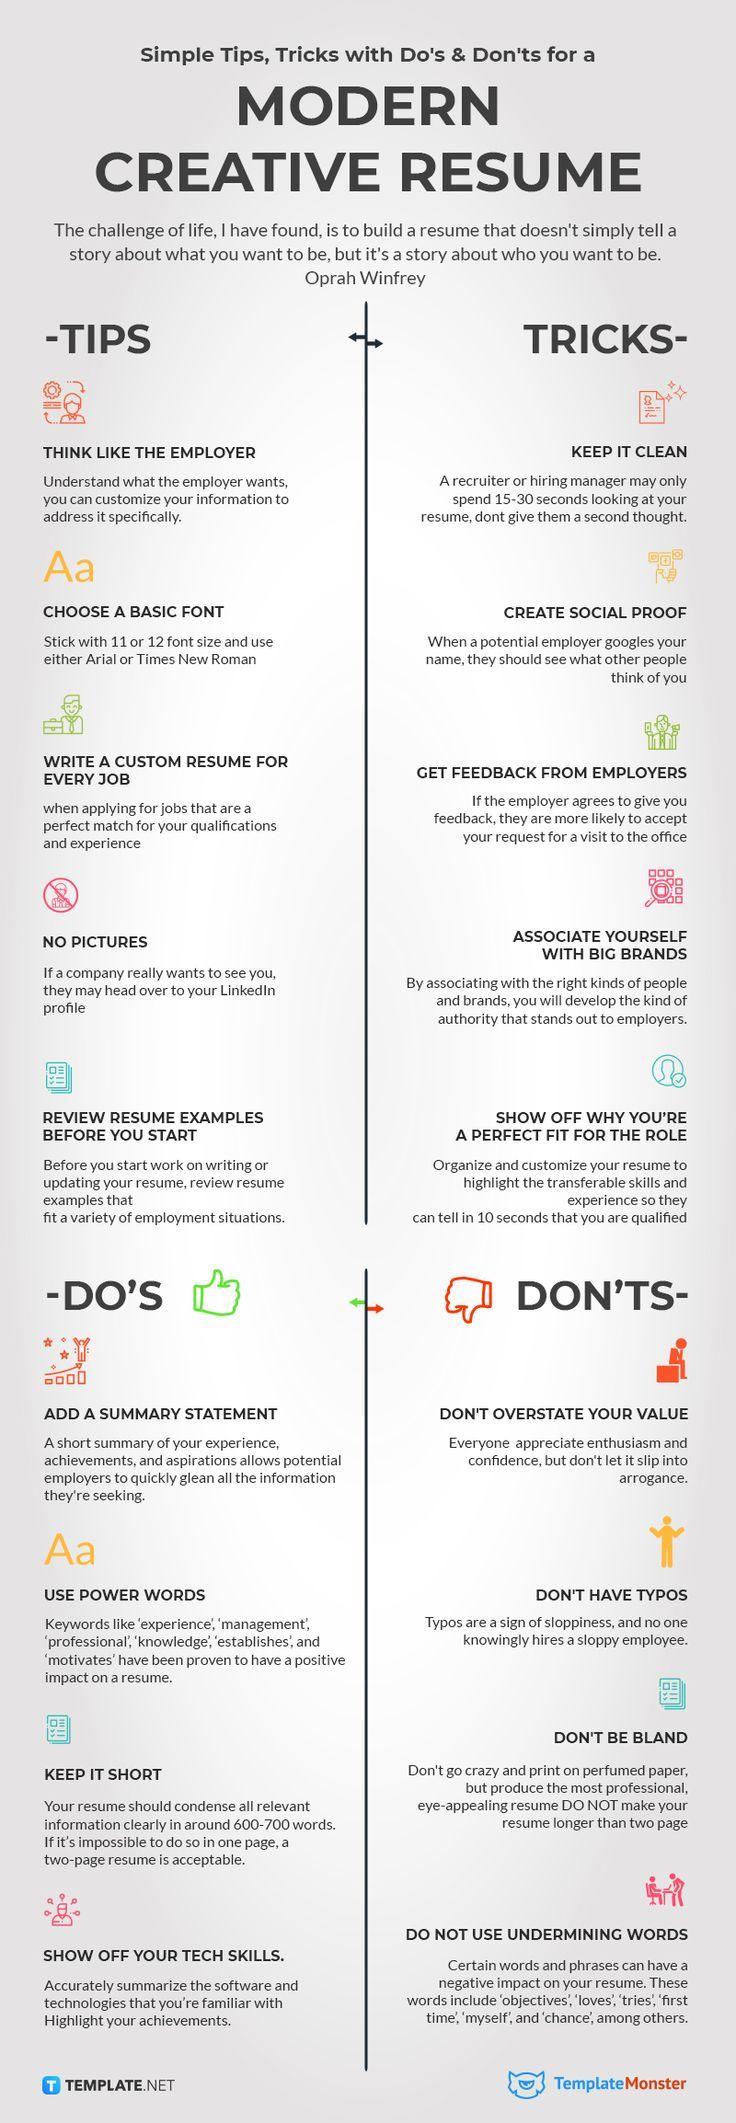 How to Create a Modern Creative Resume [Infographics